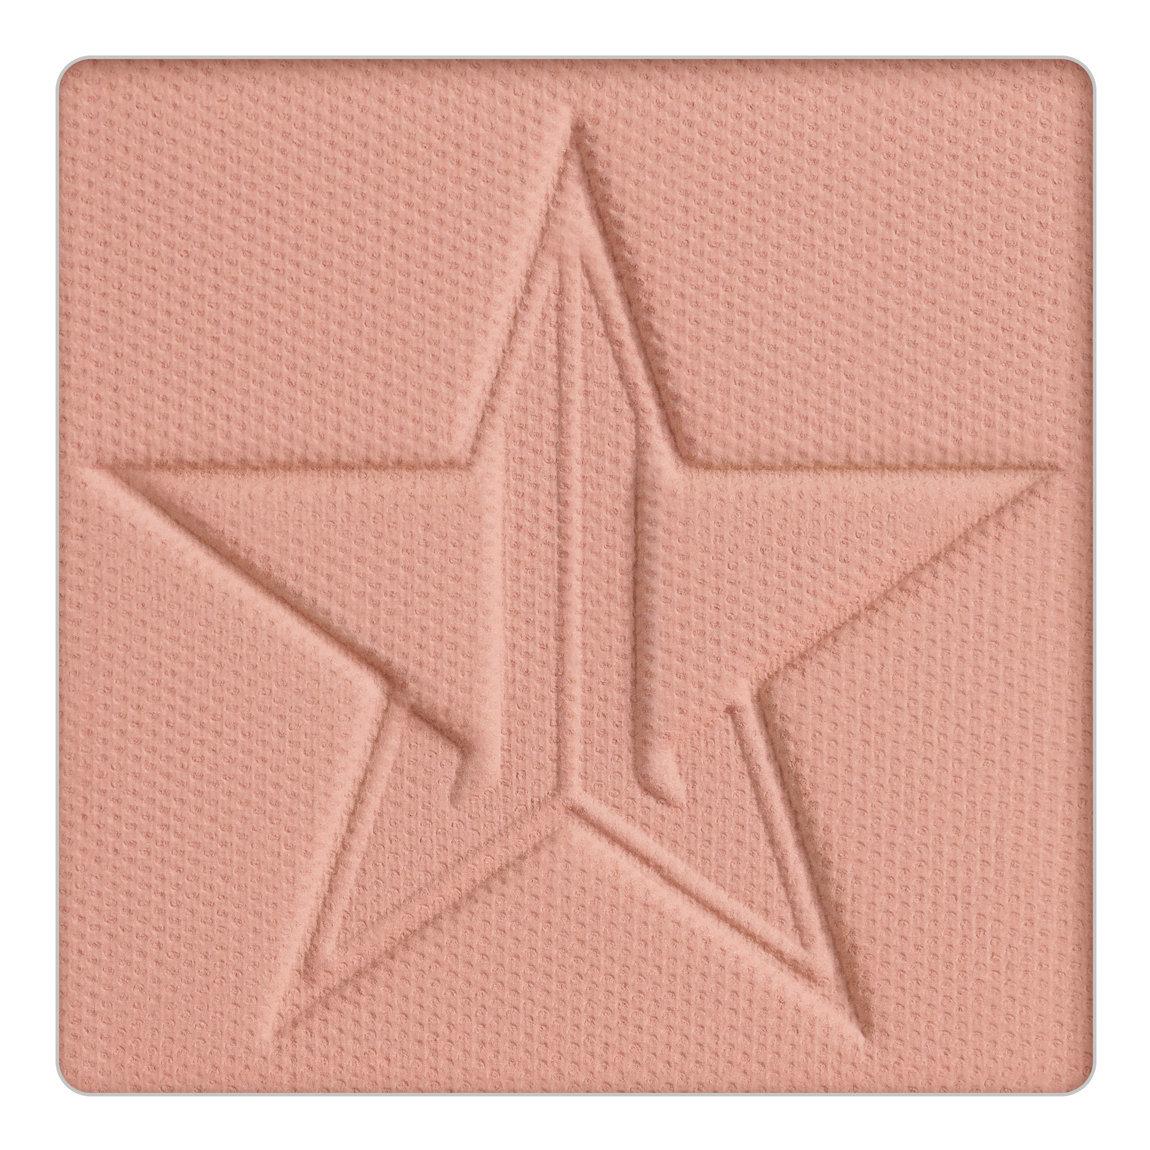 Jeffree Star Cosmetics Artistry Singles Cake Mix alternative view 1.